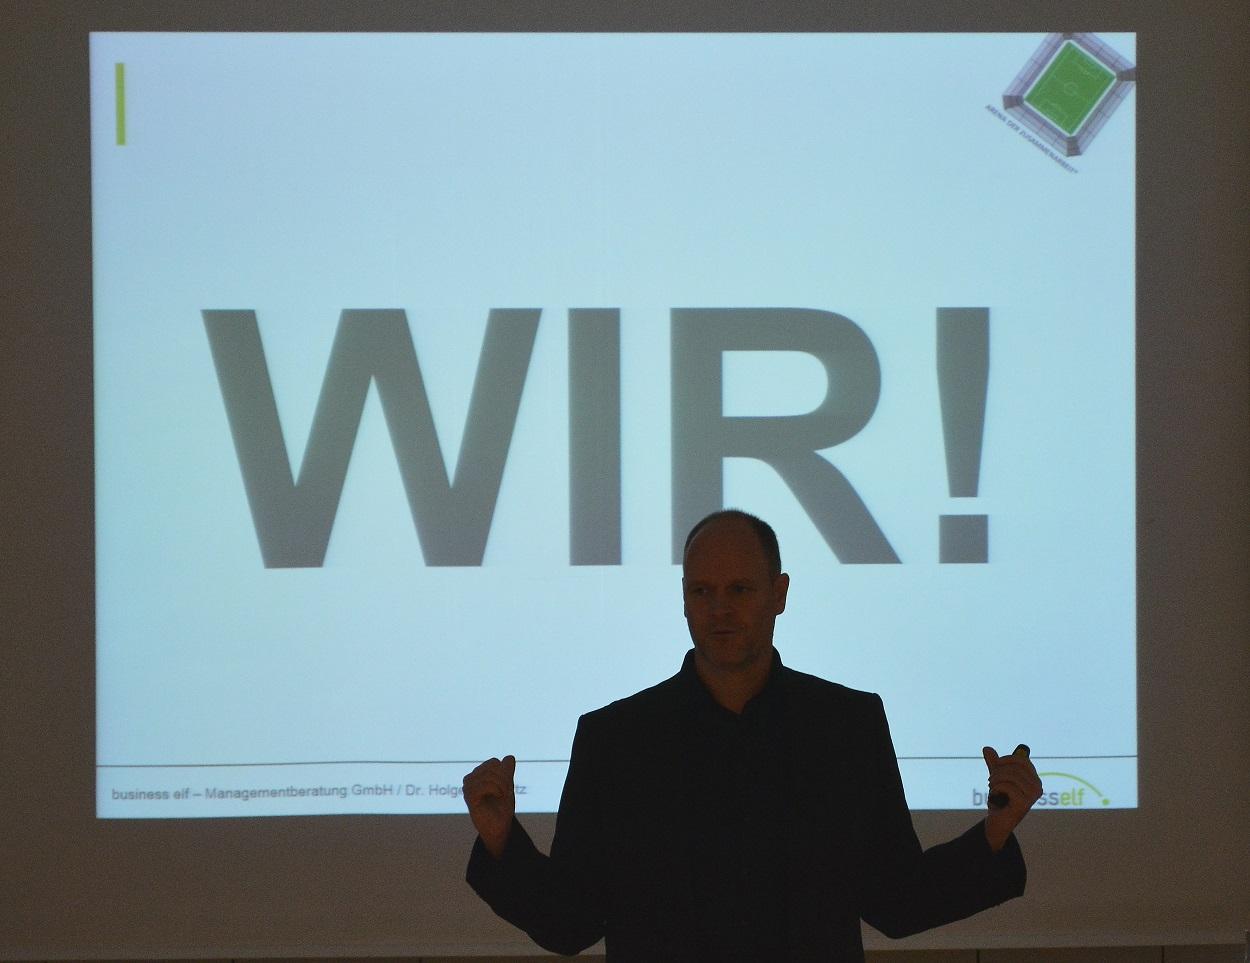 BMW Aftersaleskonferenz keynote speaker Dr. Holger Schmitz